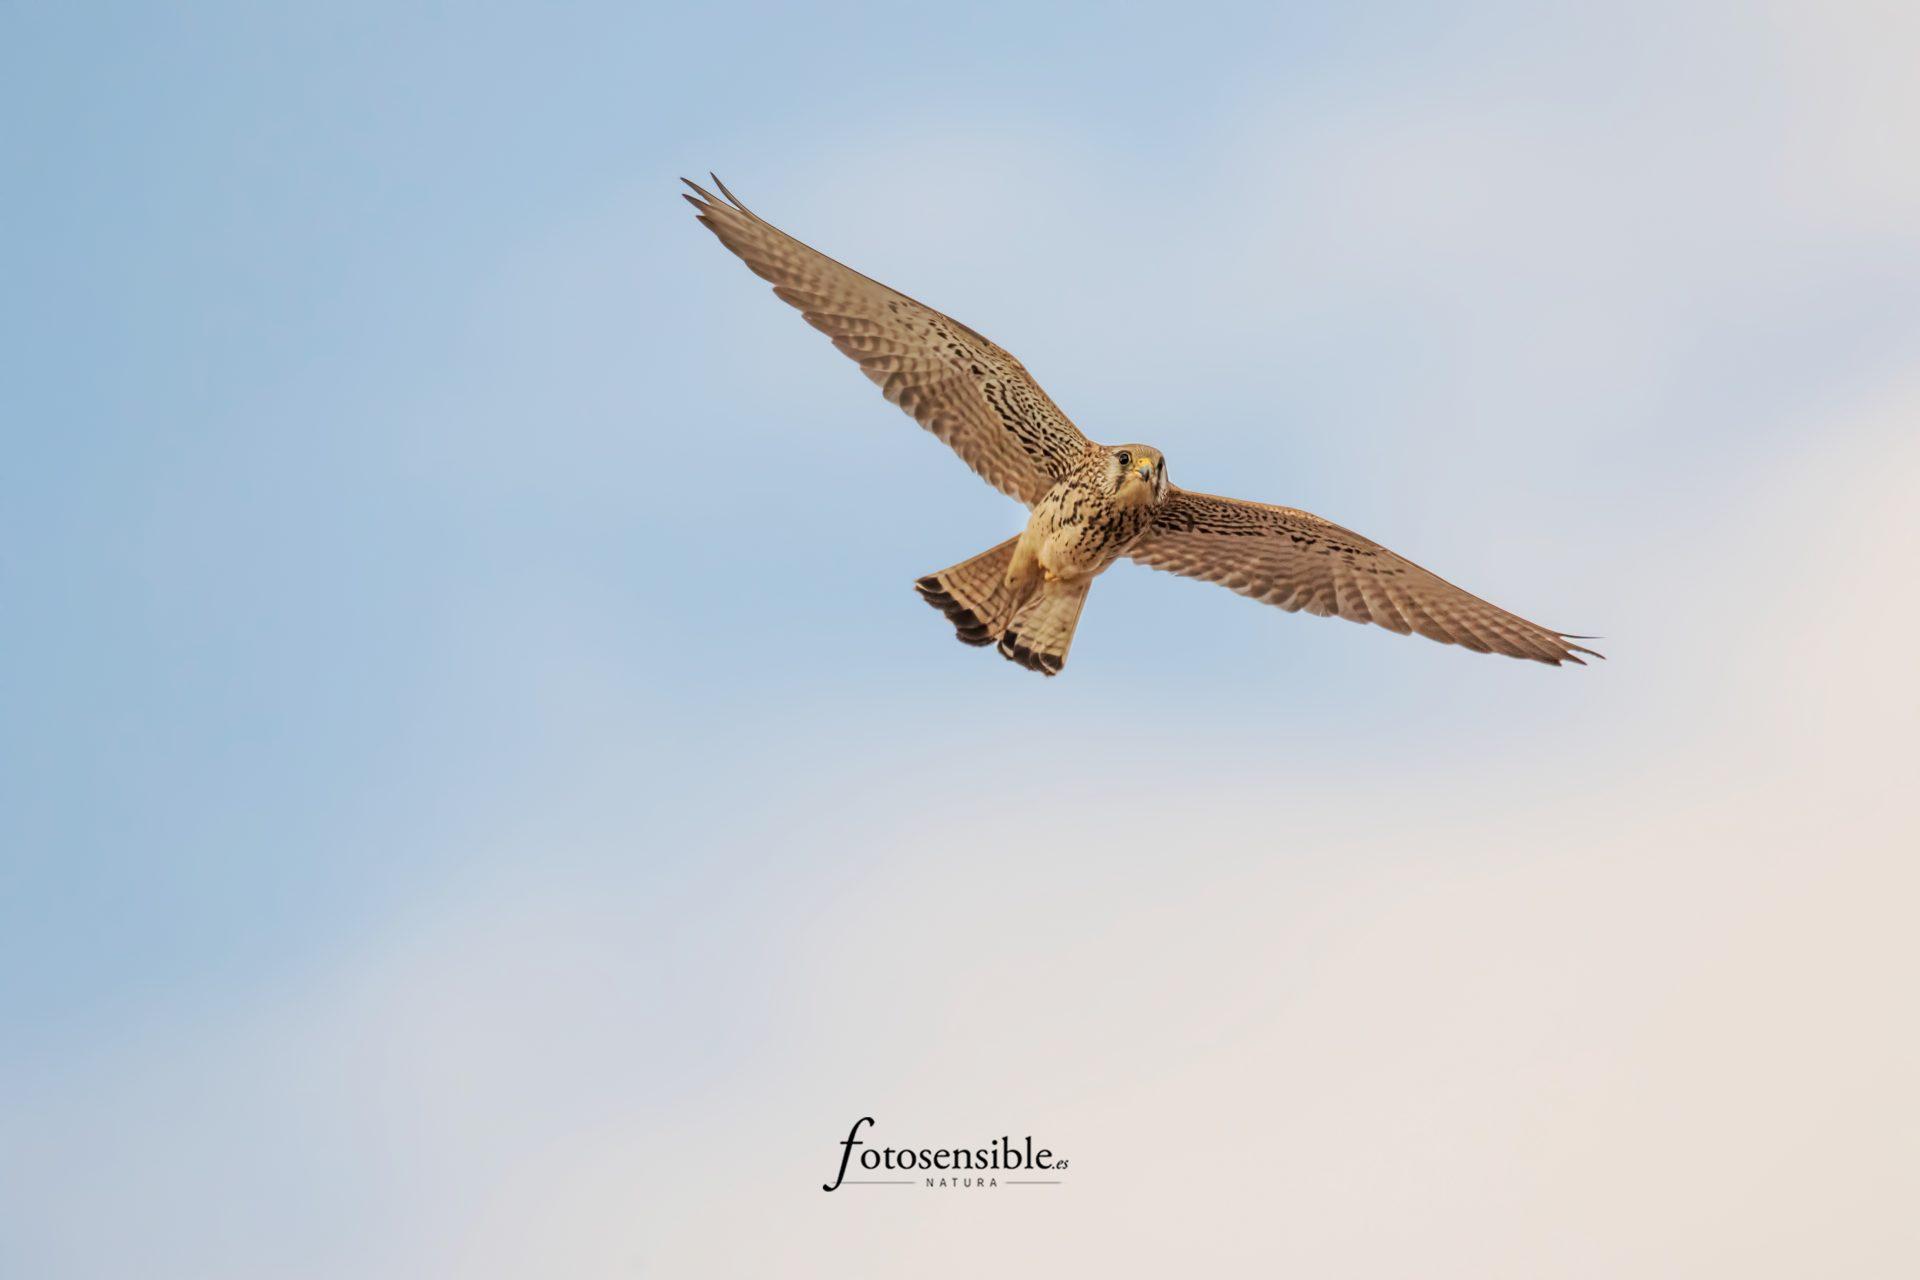 Hembra de cernícalo primilla (Falco naumanni)